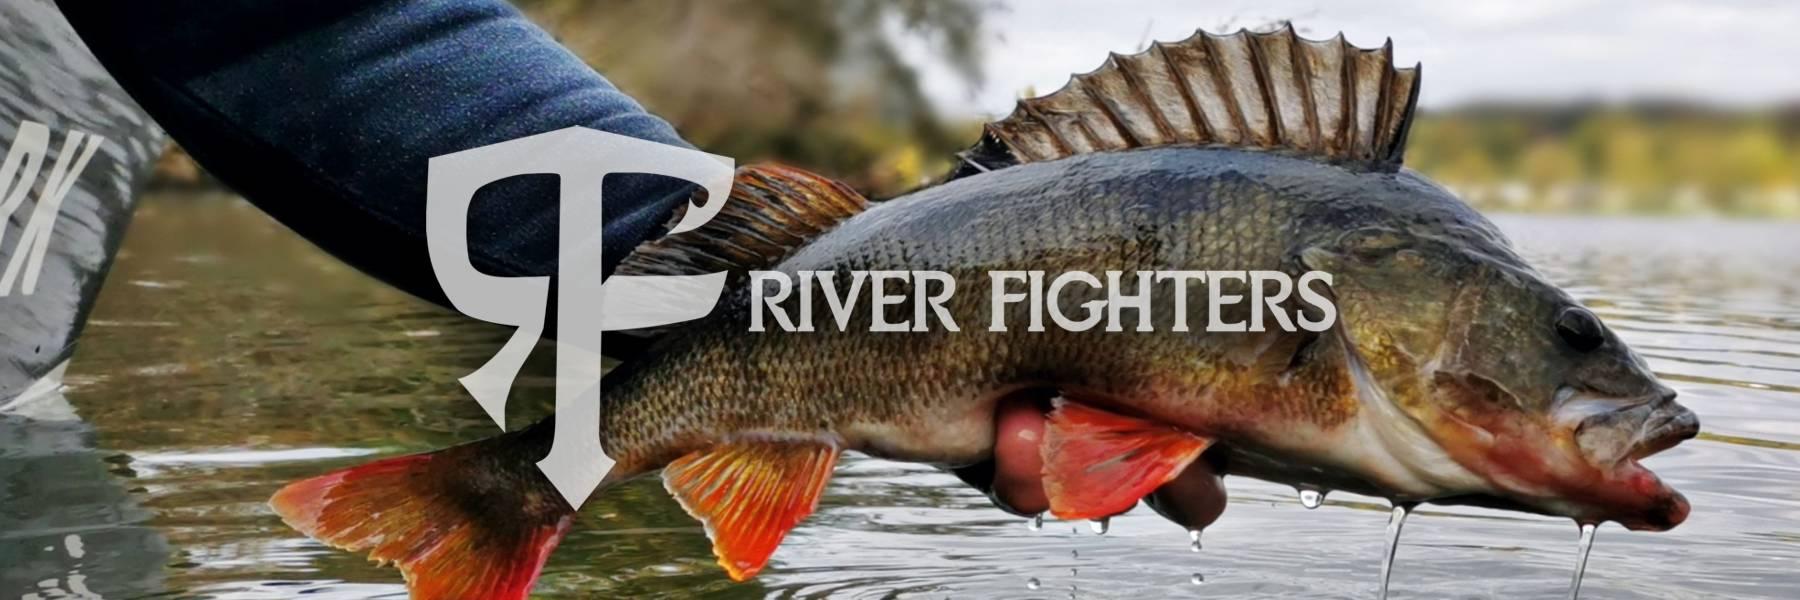 Riverfighters Raubfisch Angelshop